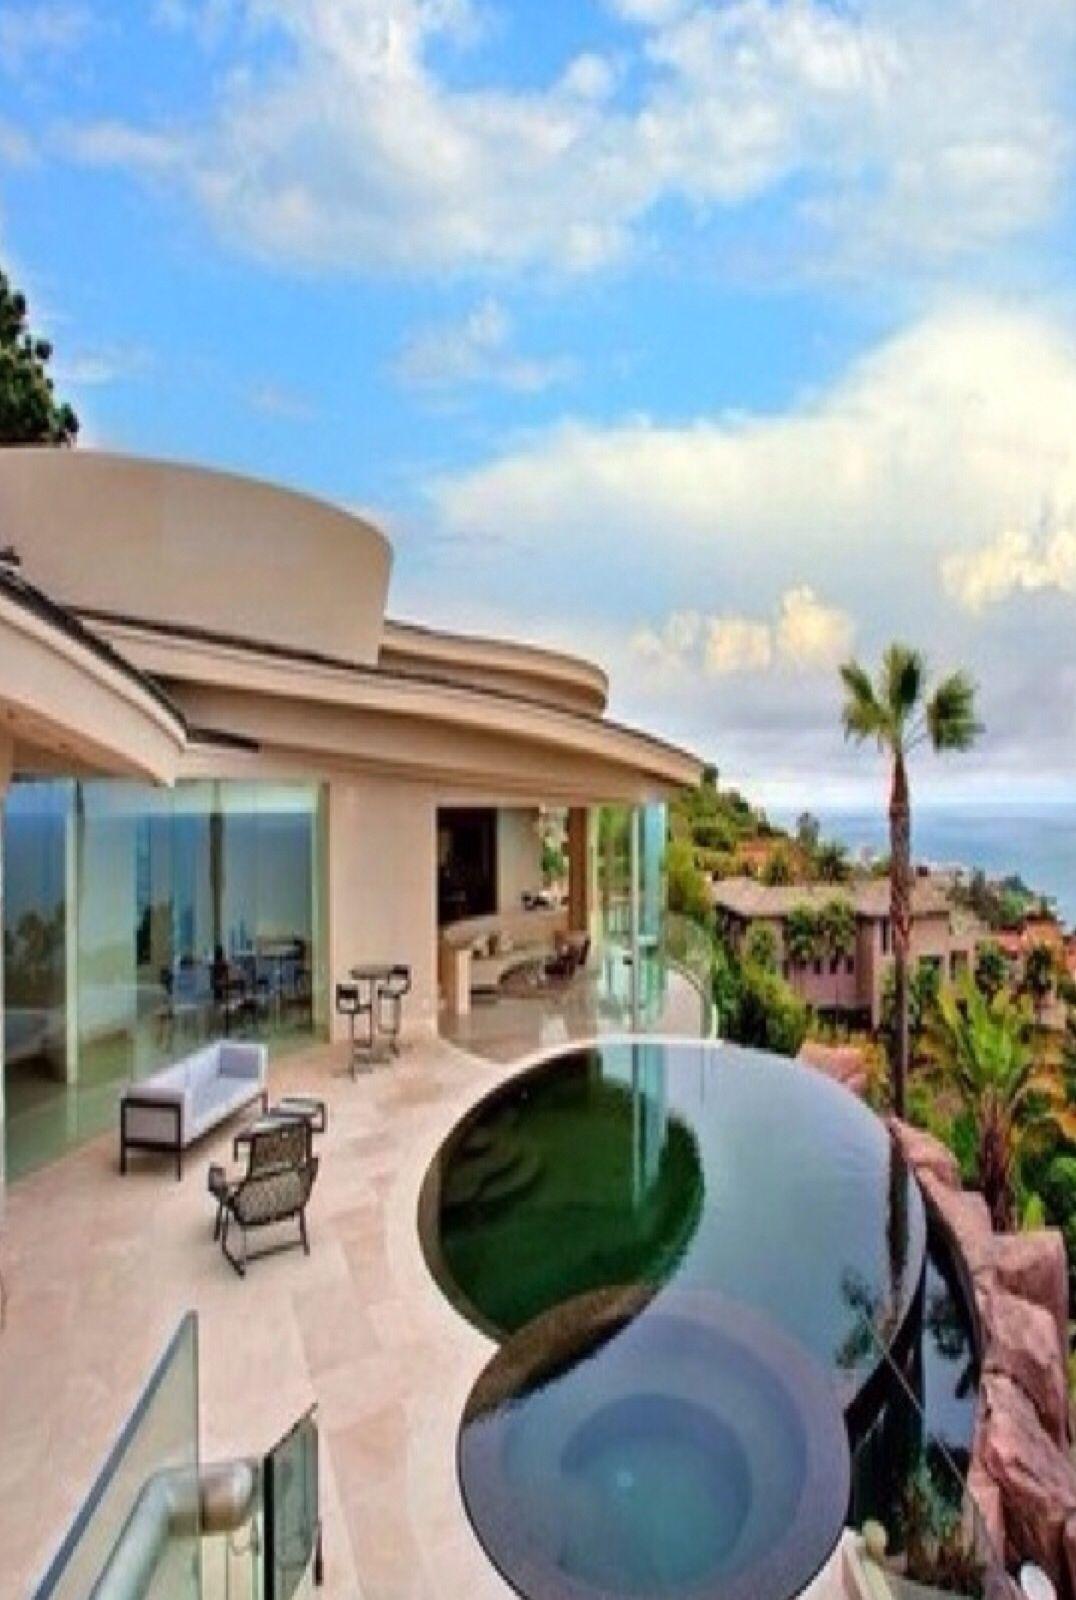 luxury homes with pools idg pools beach spa pinterest. Black Bedroom Furniture Sets. Home Design Ideas